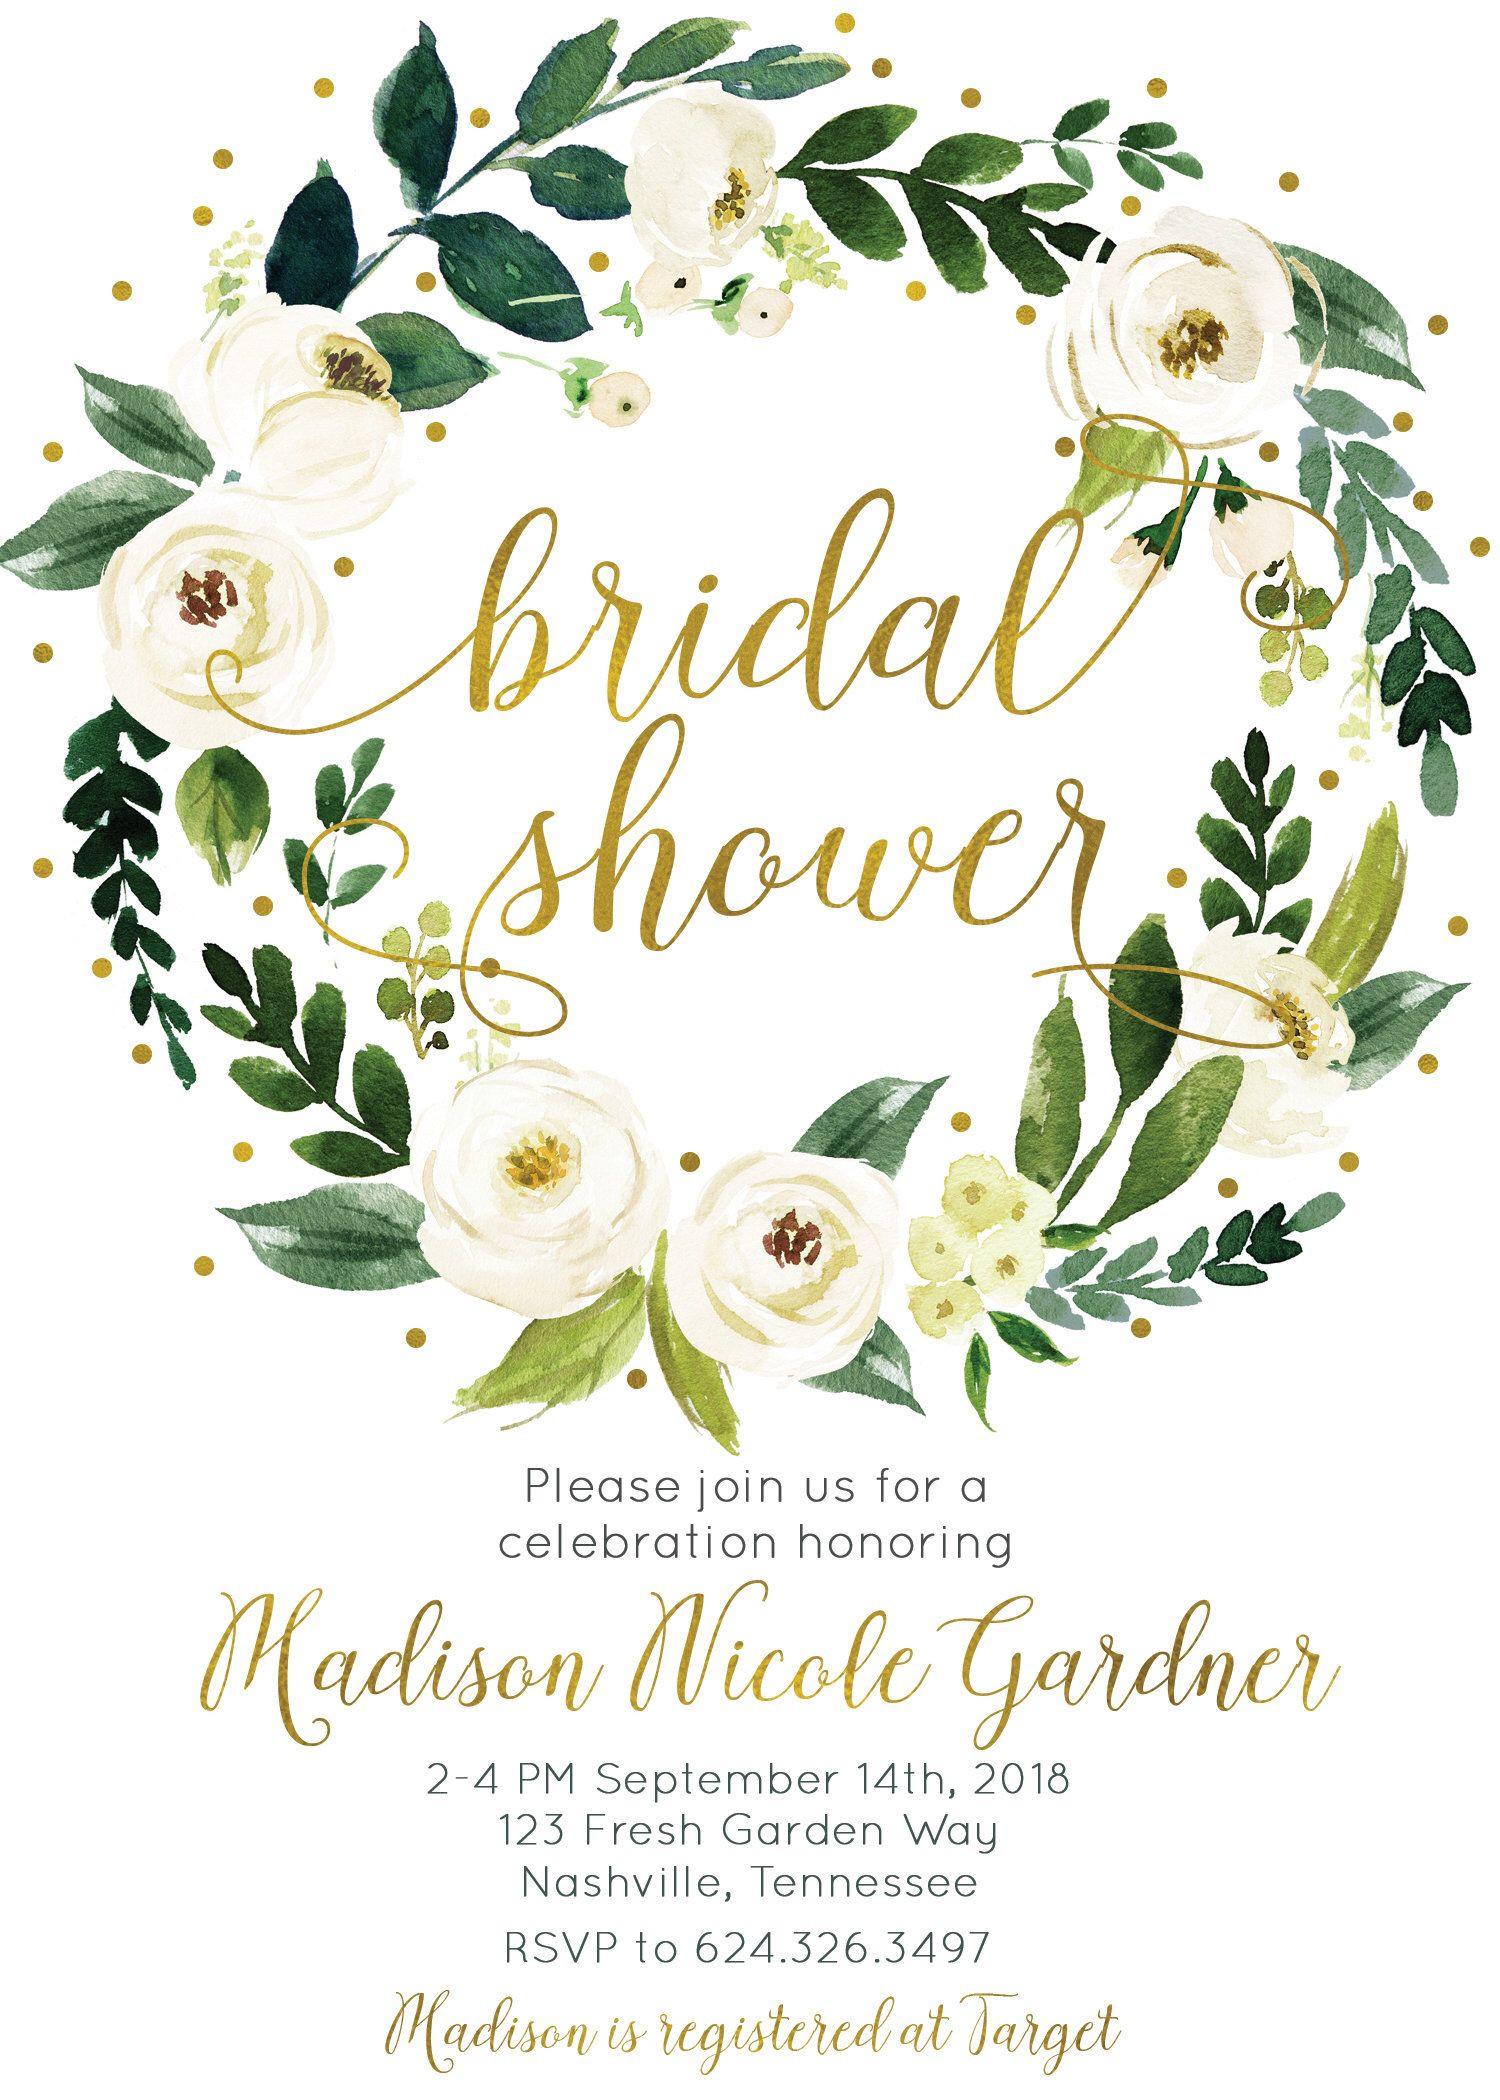 Gorgeous Bridal Shower Invitation White Cream Green Watercolor Floral Wreath Digital Printable invitation white